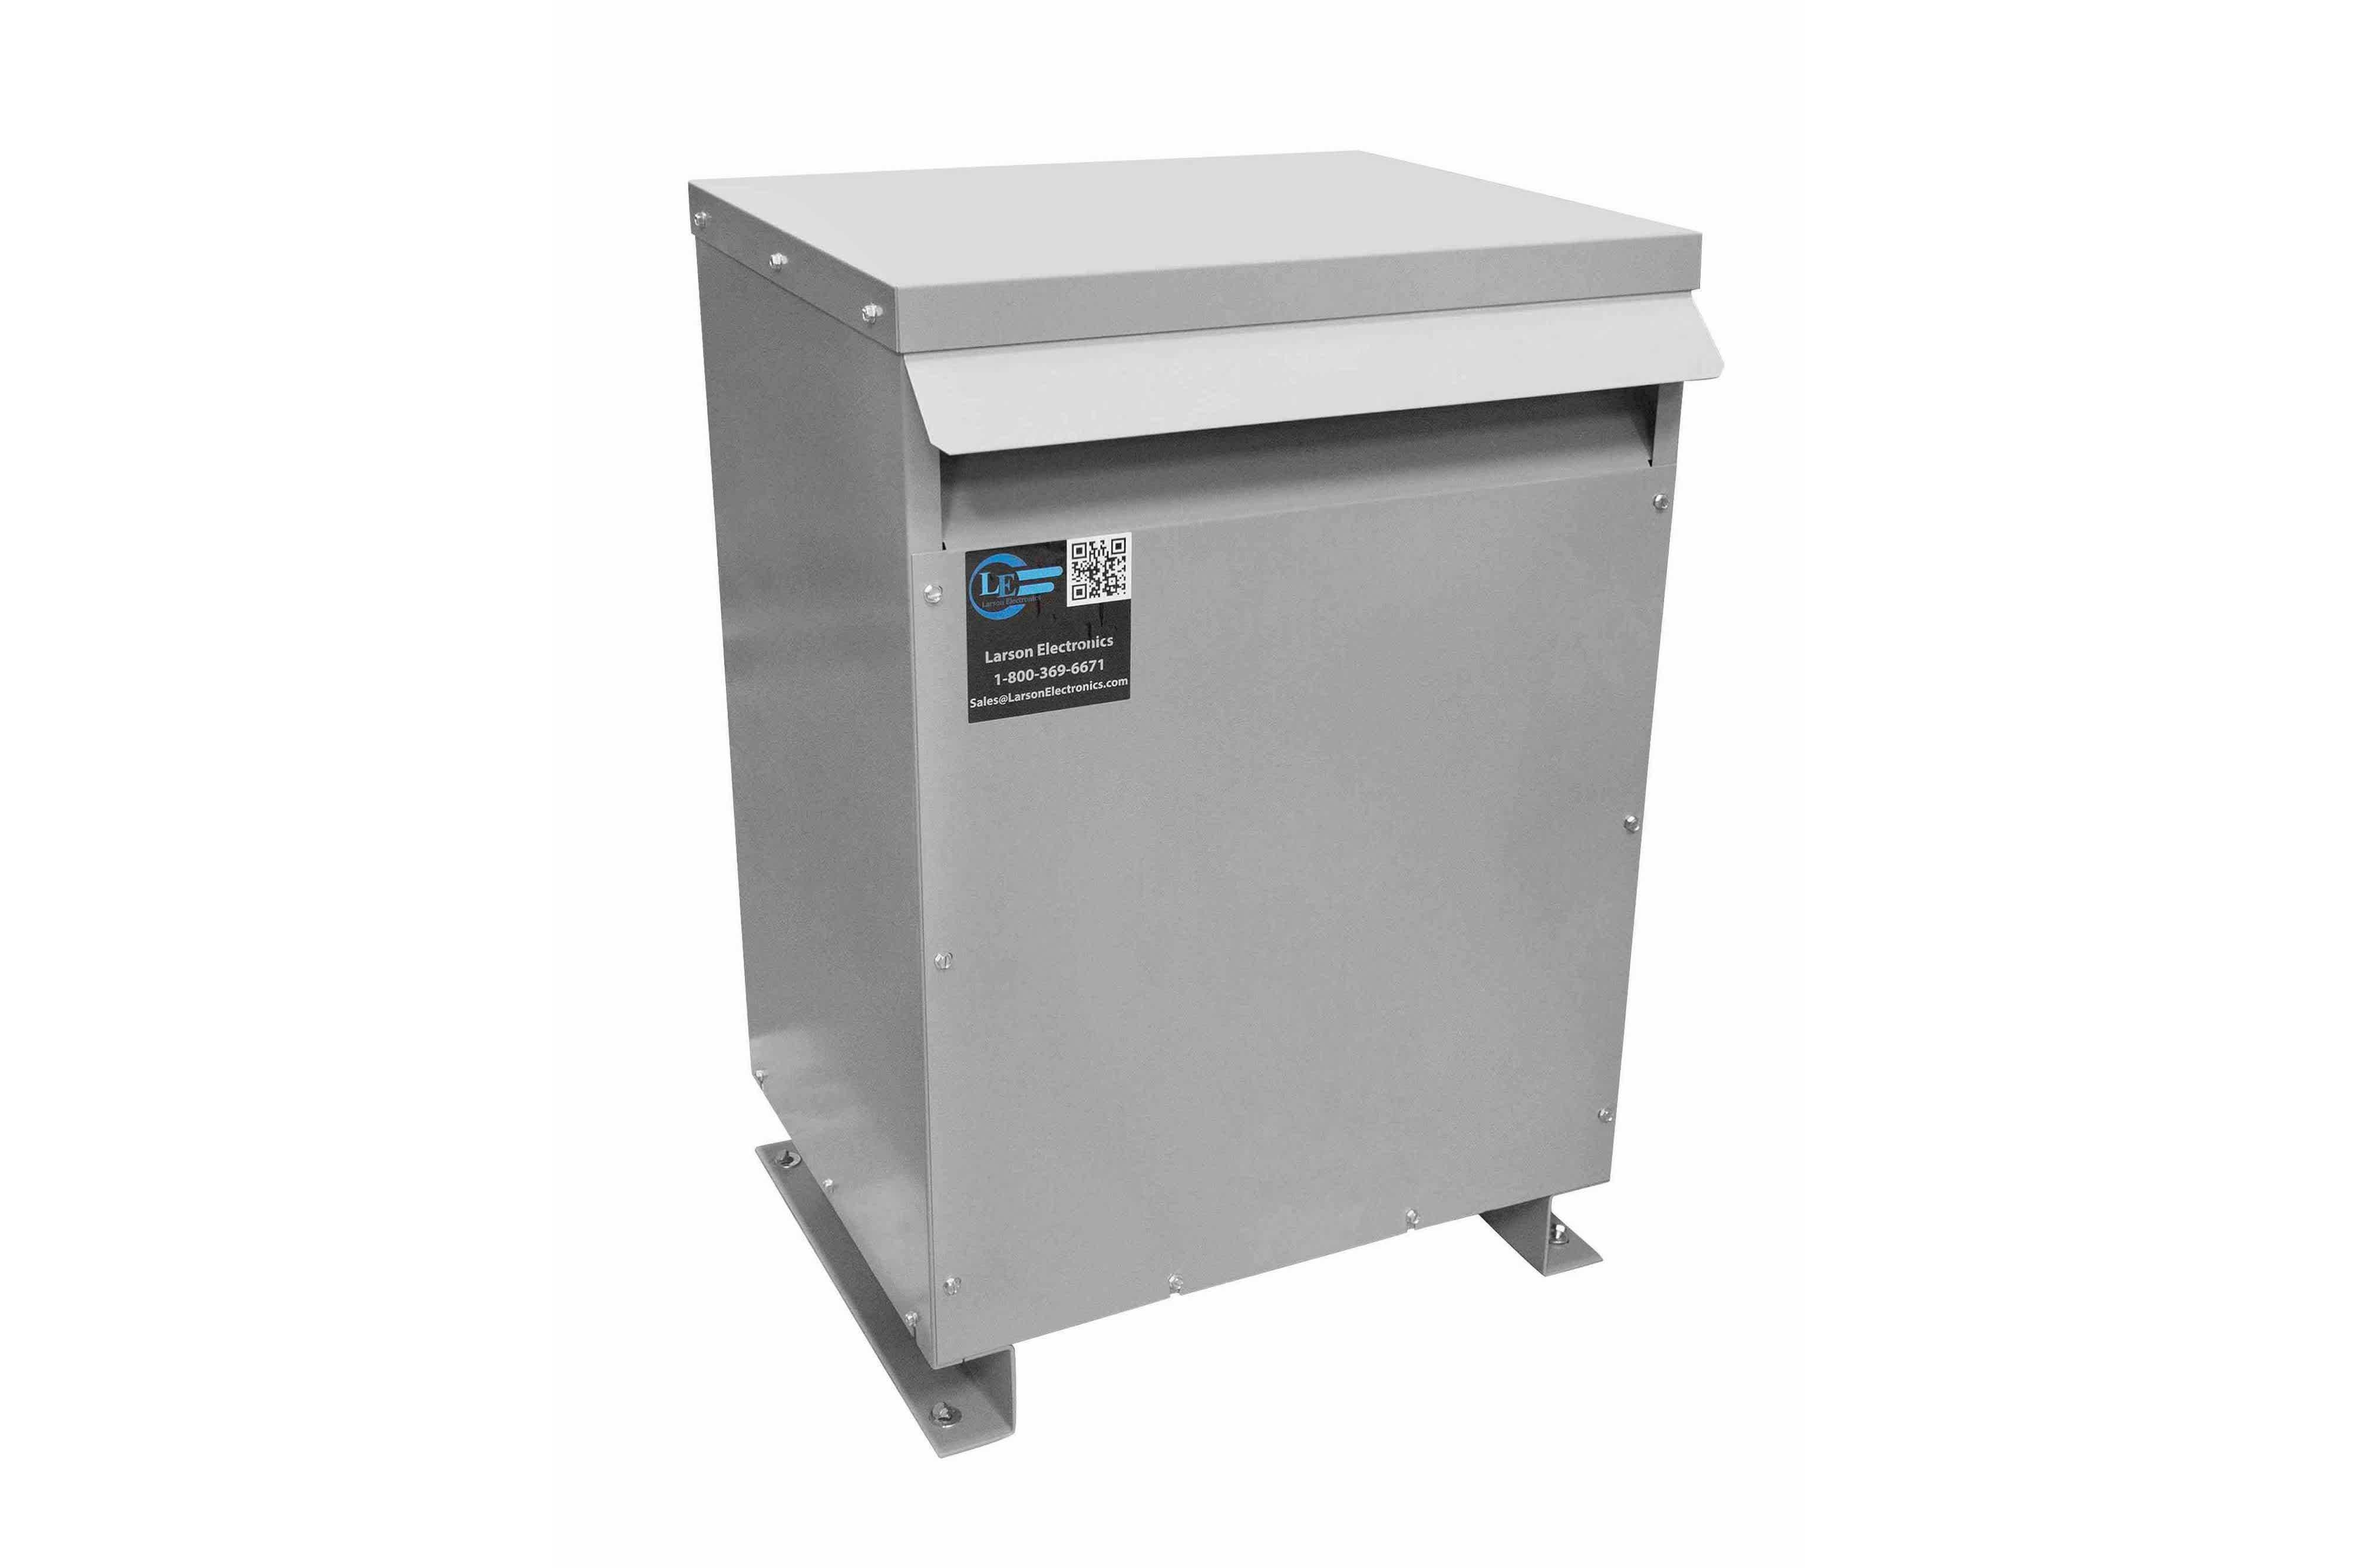 750 kVA 3PH DOE Transformer, 380V Delta Primary, 208Y/120 Wye-N Secondary, N3R, Ventilated, 60 Hz